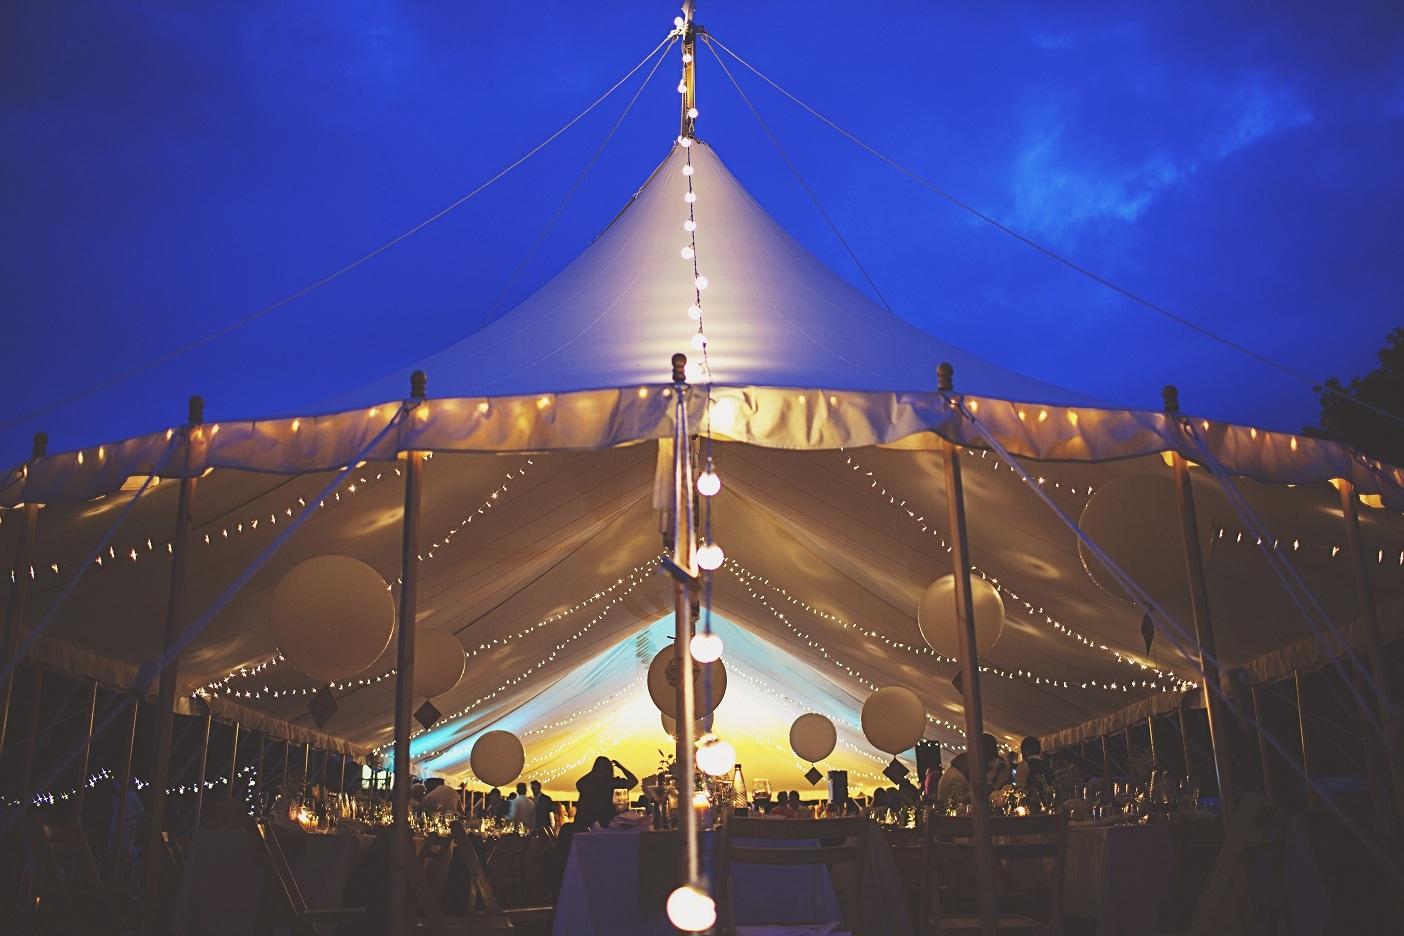 9 x 30 Canopy Giggleswick.jpg